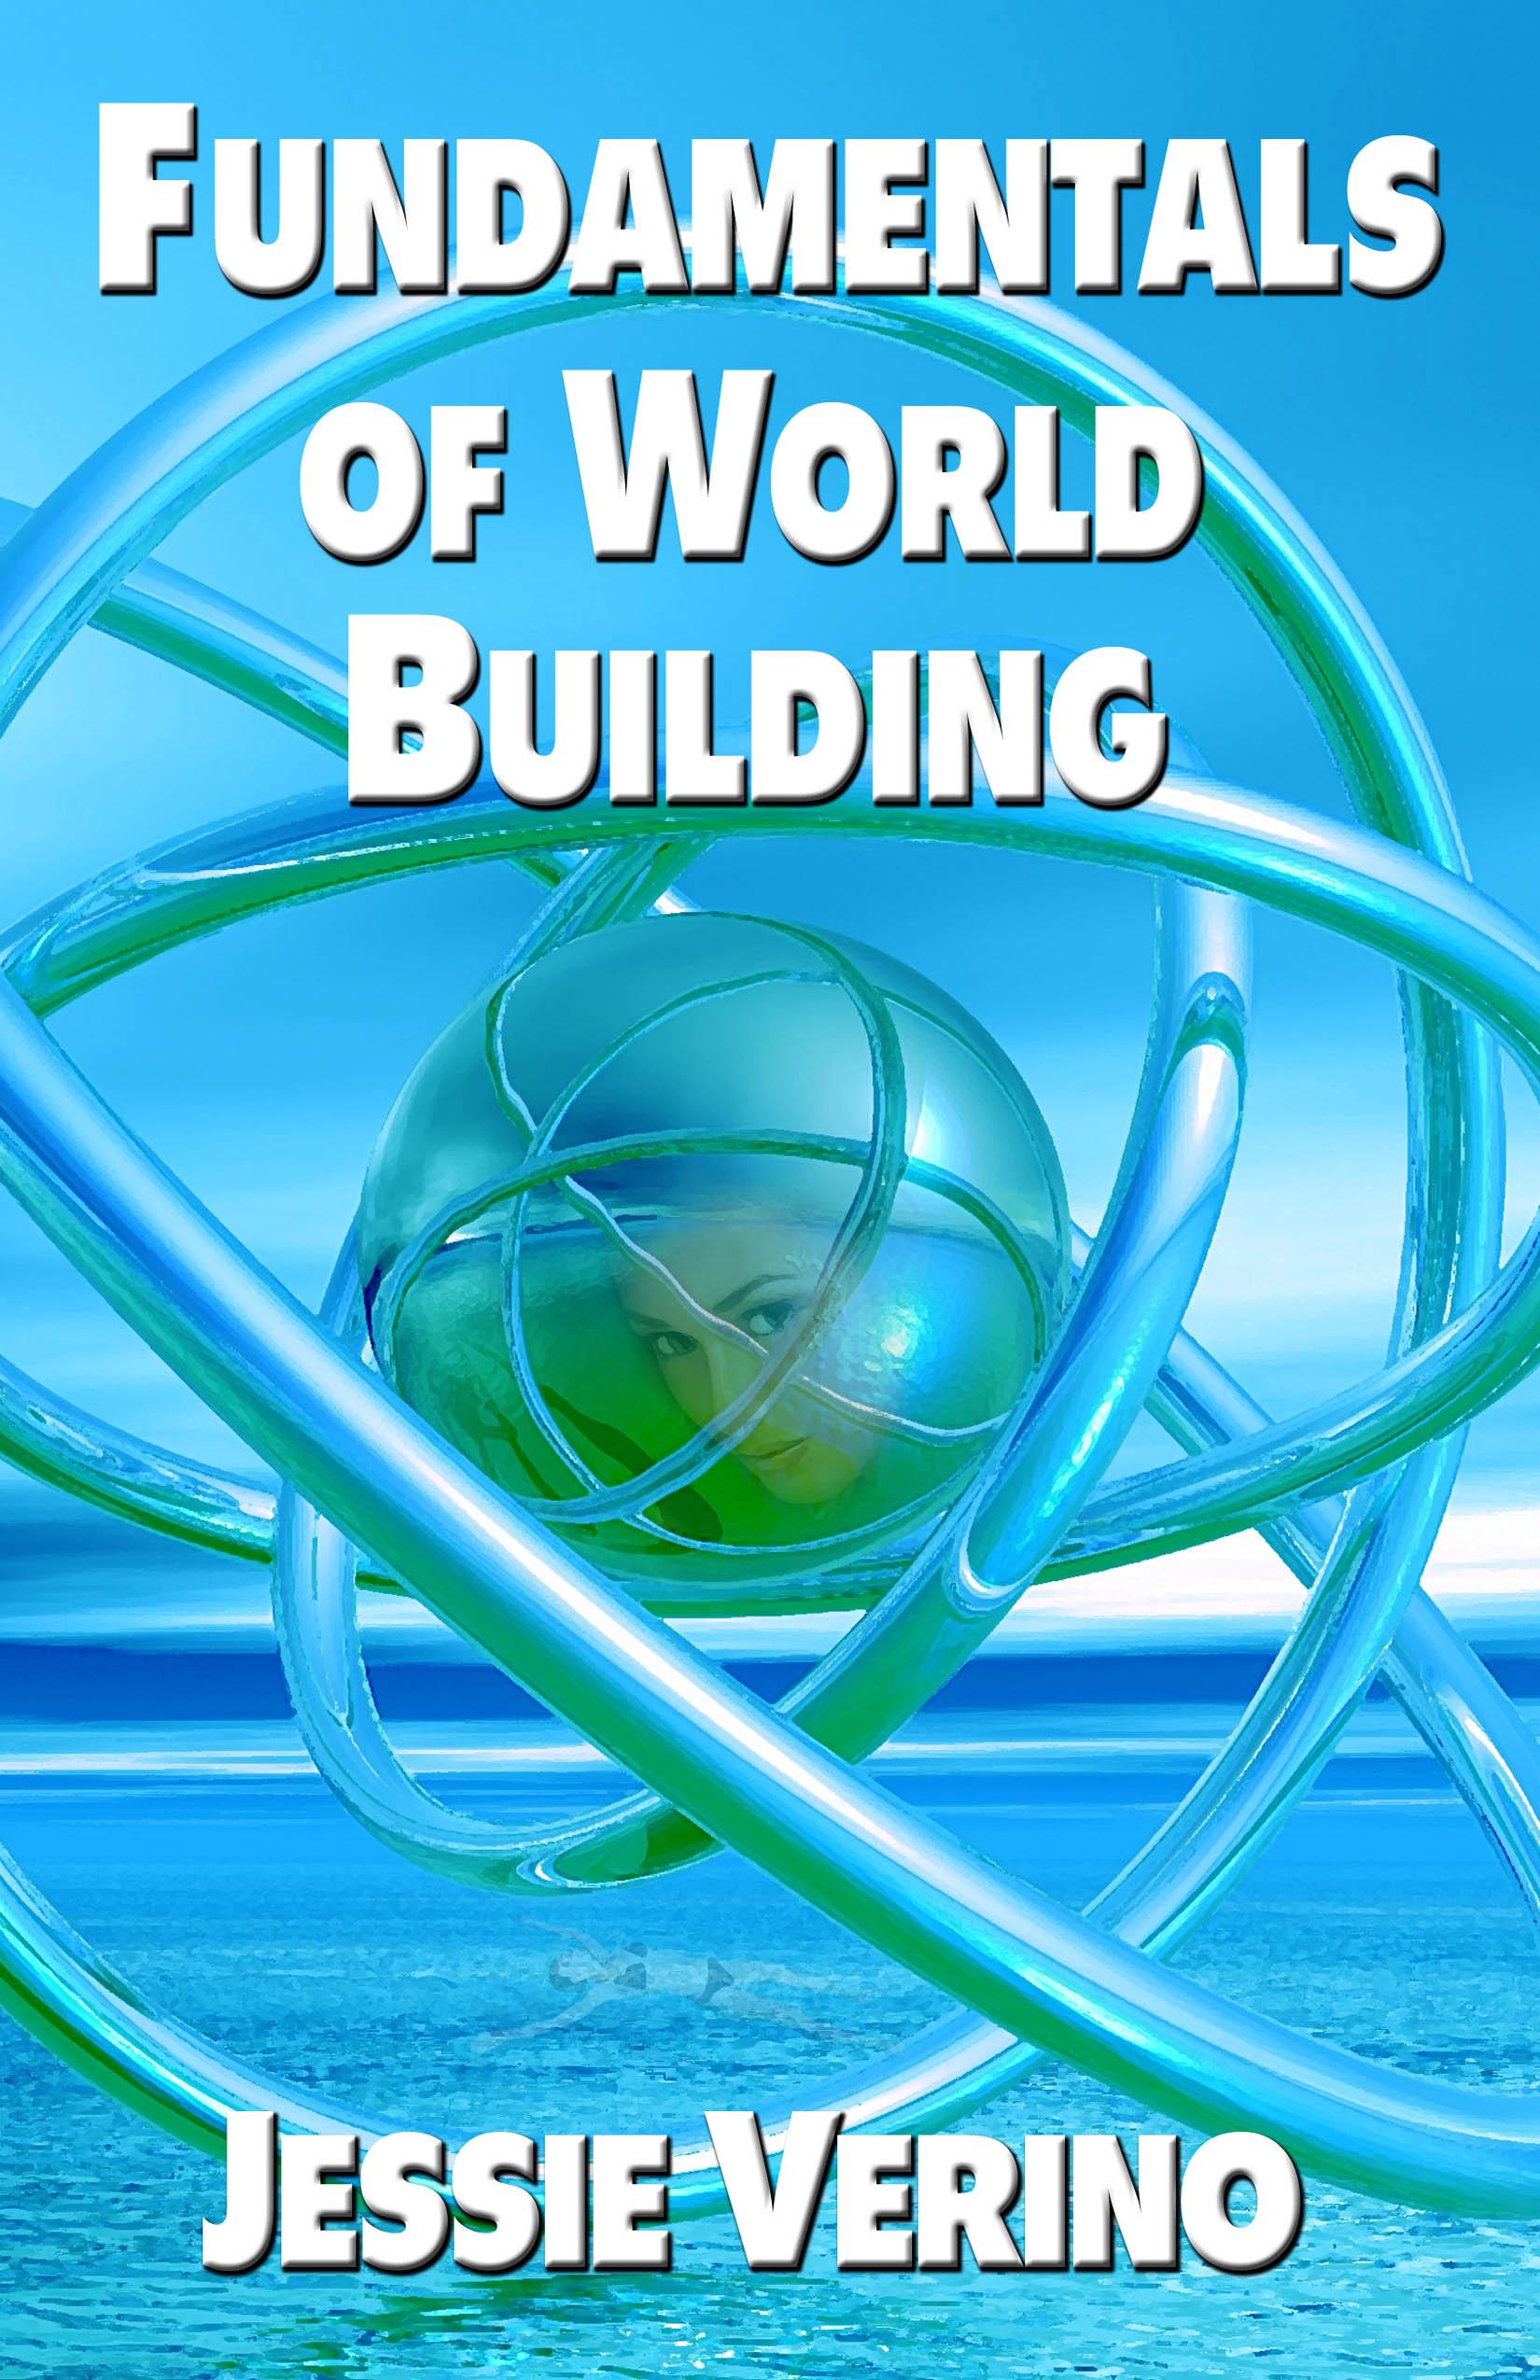 Fundamentals of World Building